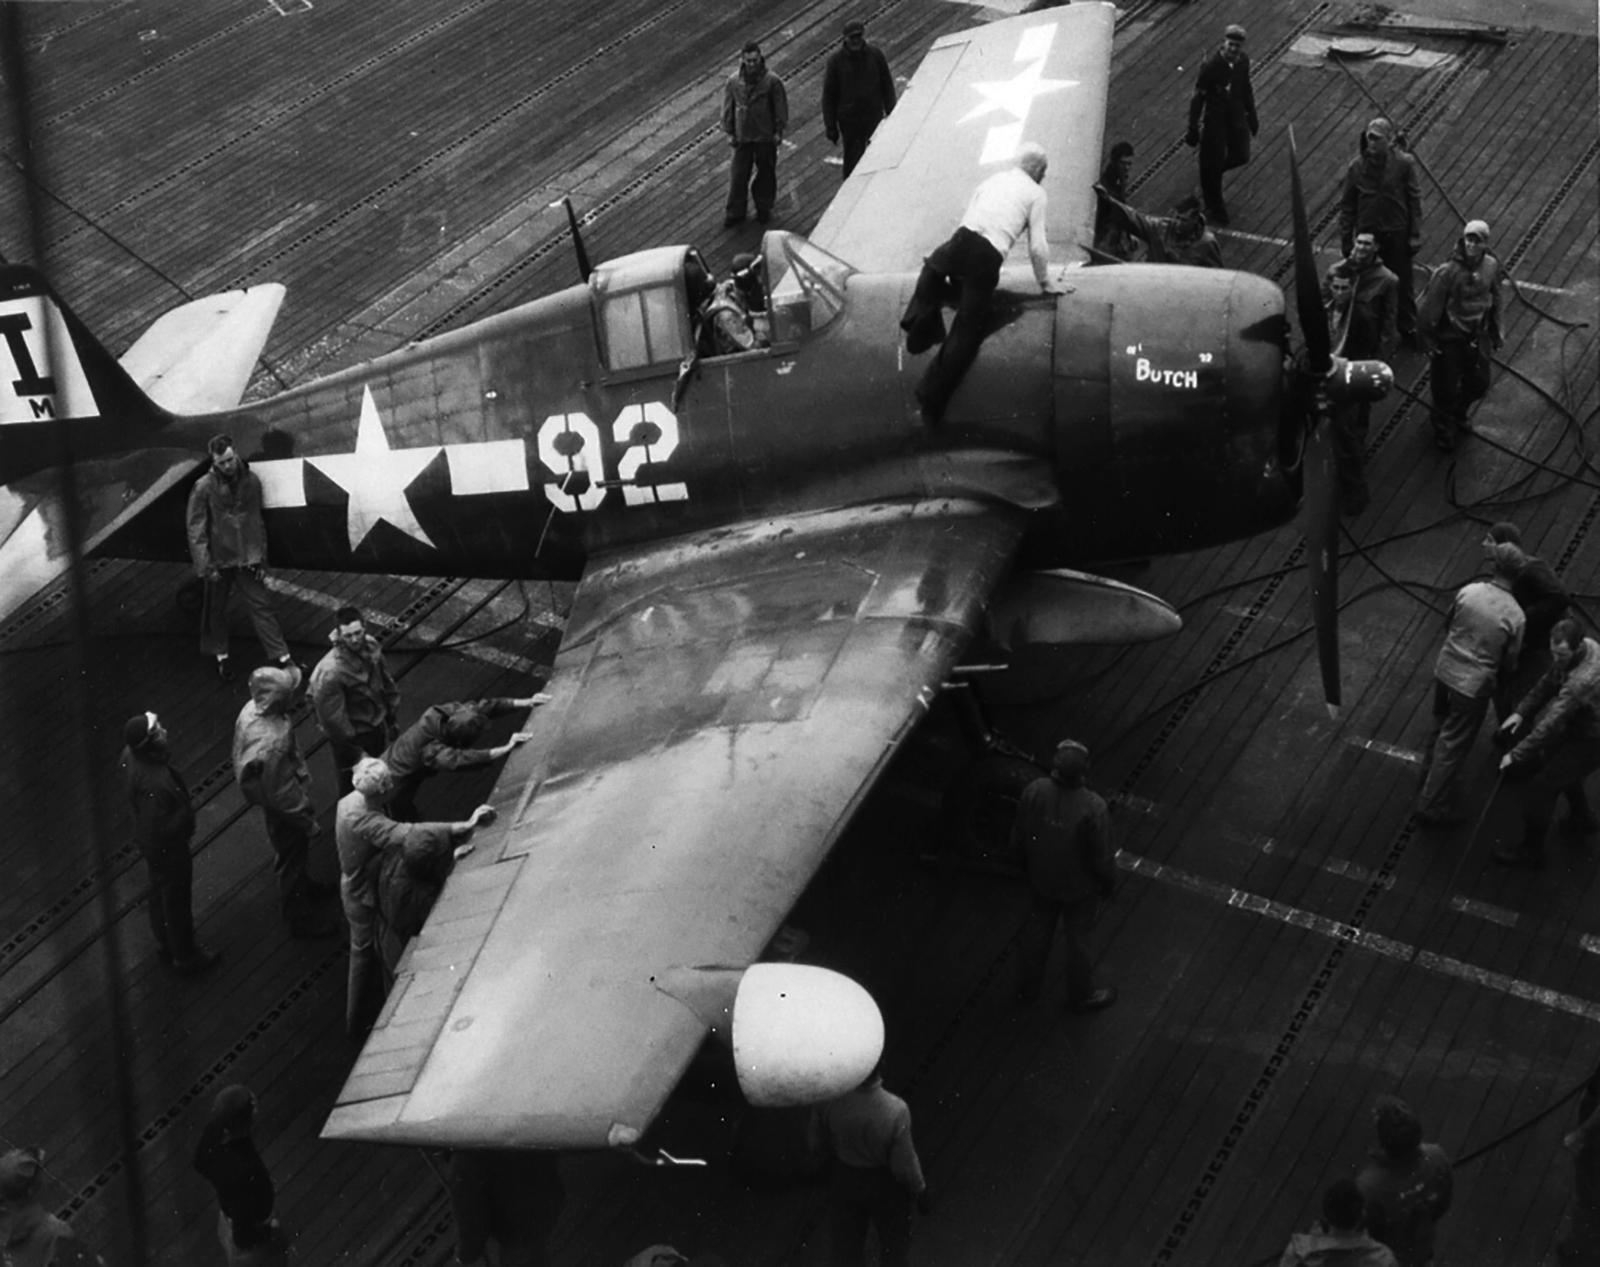 Grumman F6F 5 Hellcat MCVG 1 White 92 aboard CVE 106 USS Block Island II May 1945 01